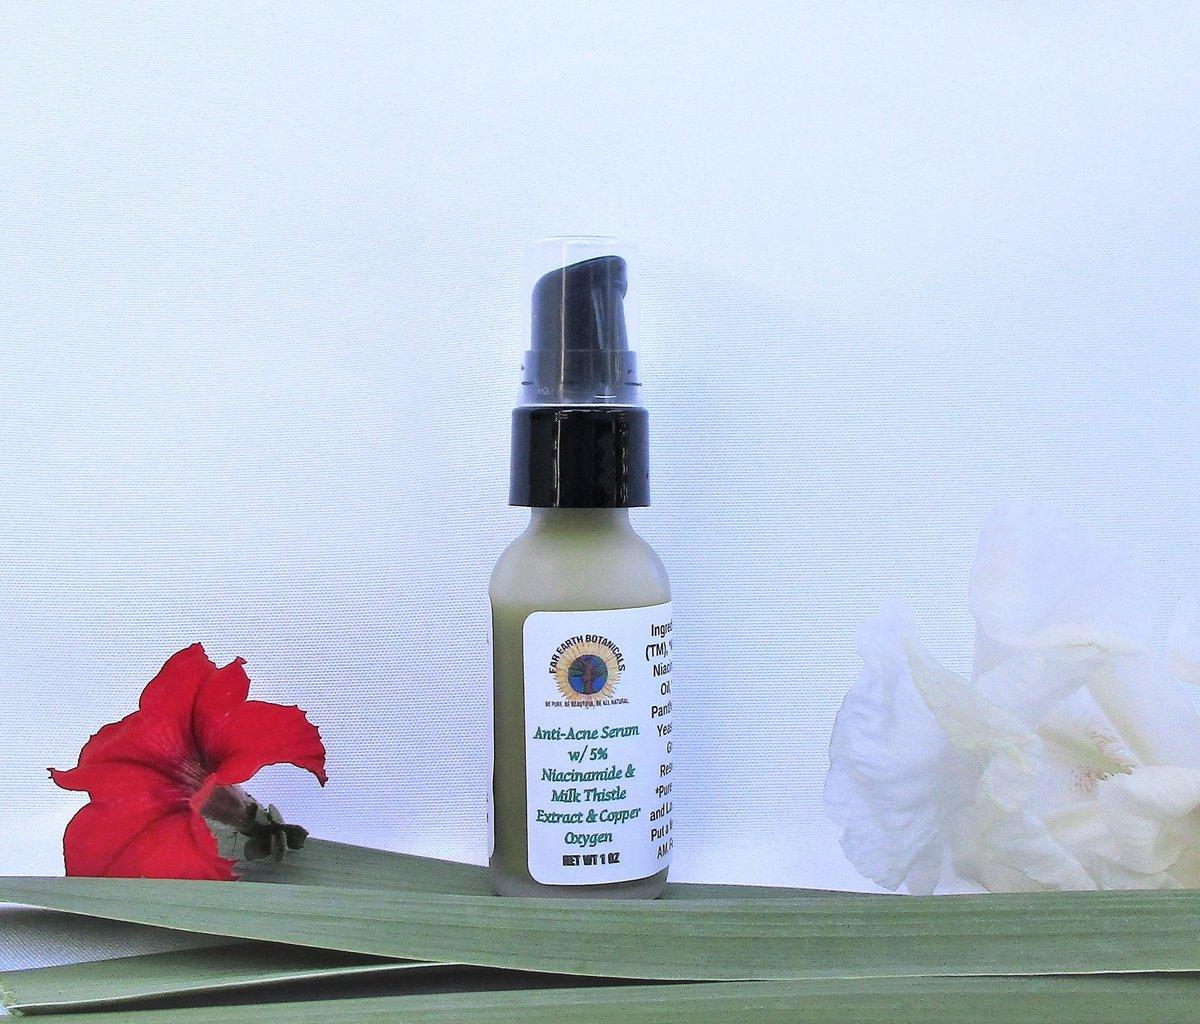 New-Anti-acne serum! #greenbeauty #zerowaste #acne #NaturalBeauty #willowbarkpic.twitter.com/vHPvjuaYrh